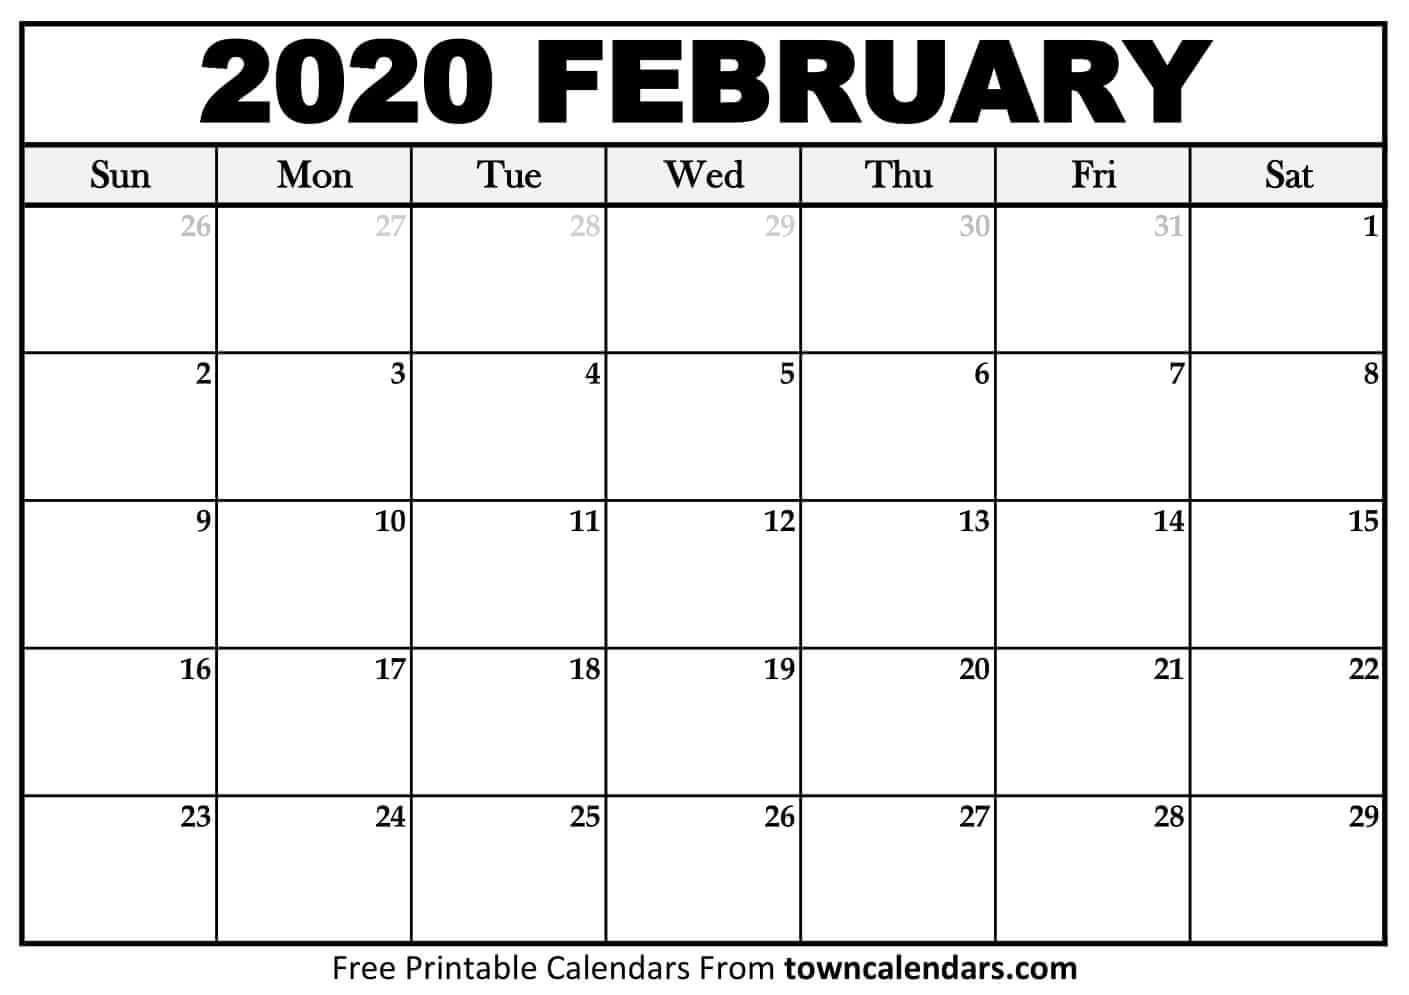 Printable February 2020 Calendar - Towncalendars  Printable February 2020 Calendar